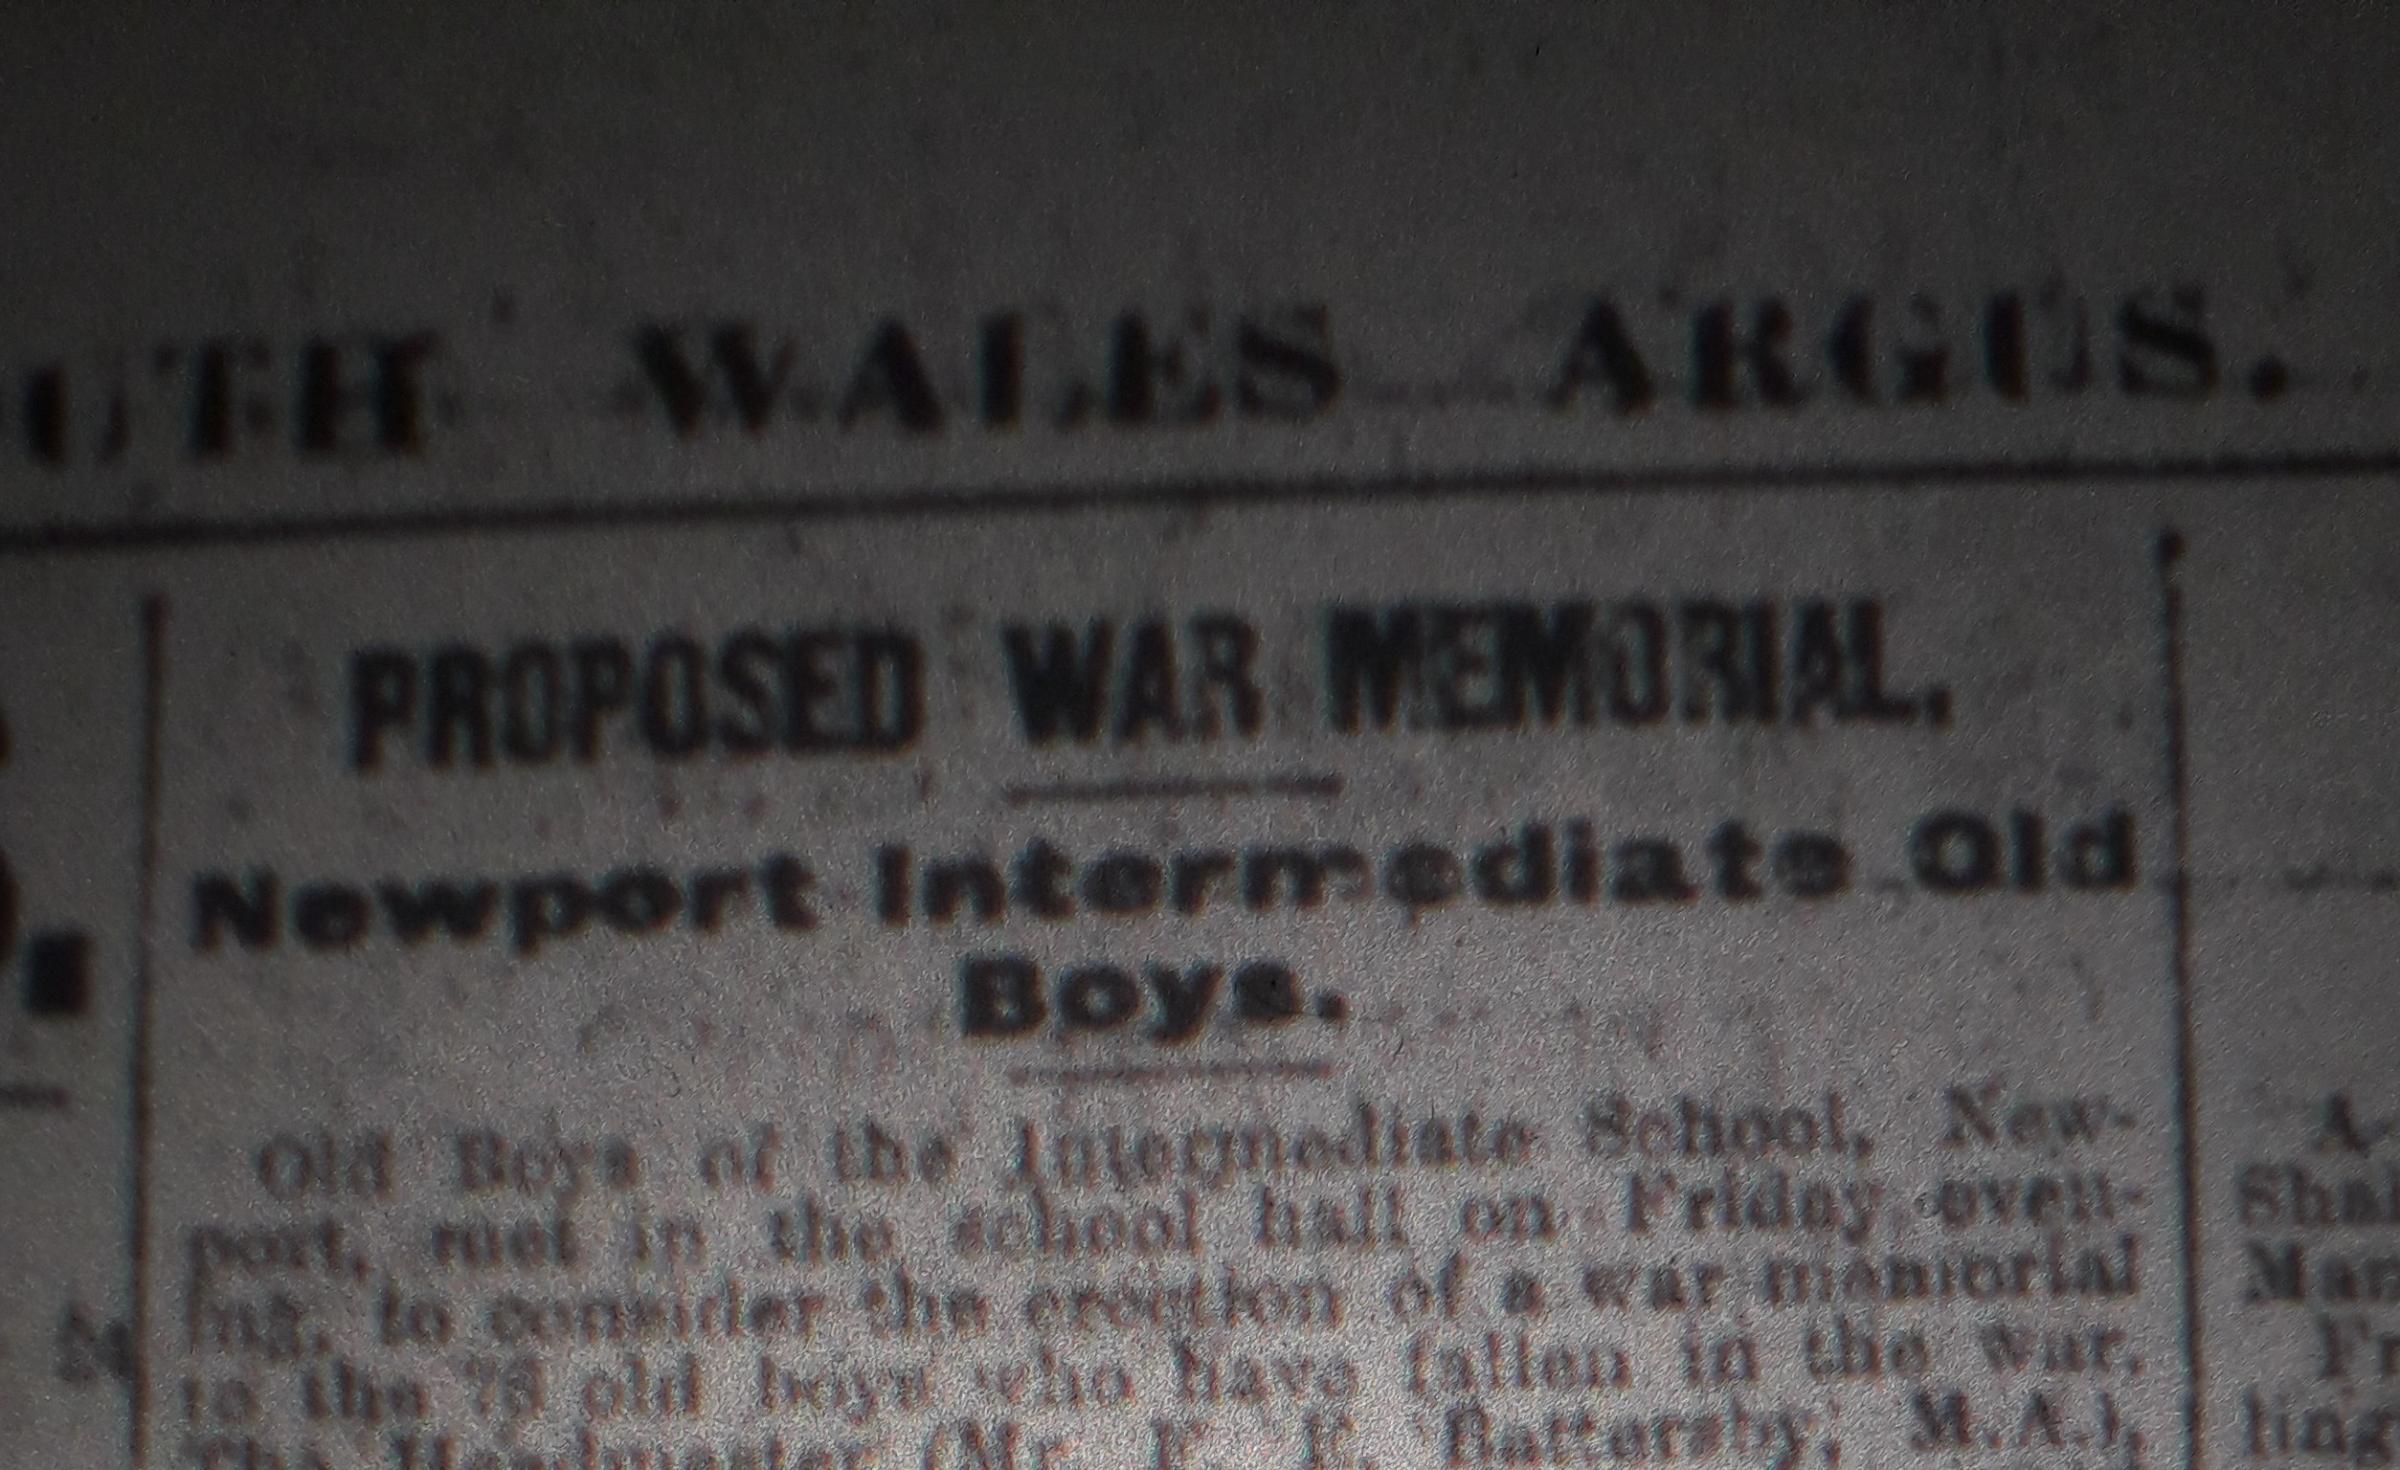 100 Years Ago: Newport school plans war memorial to its former pupils